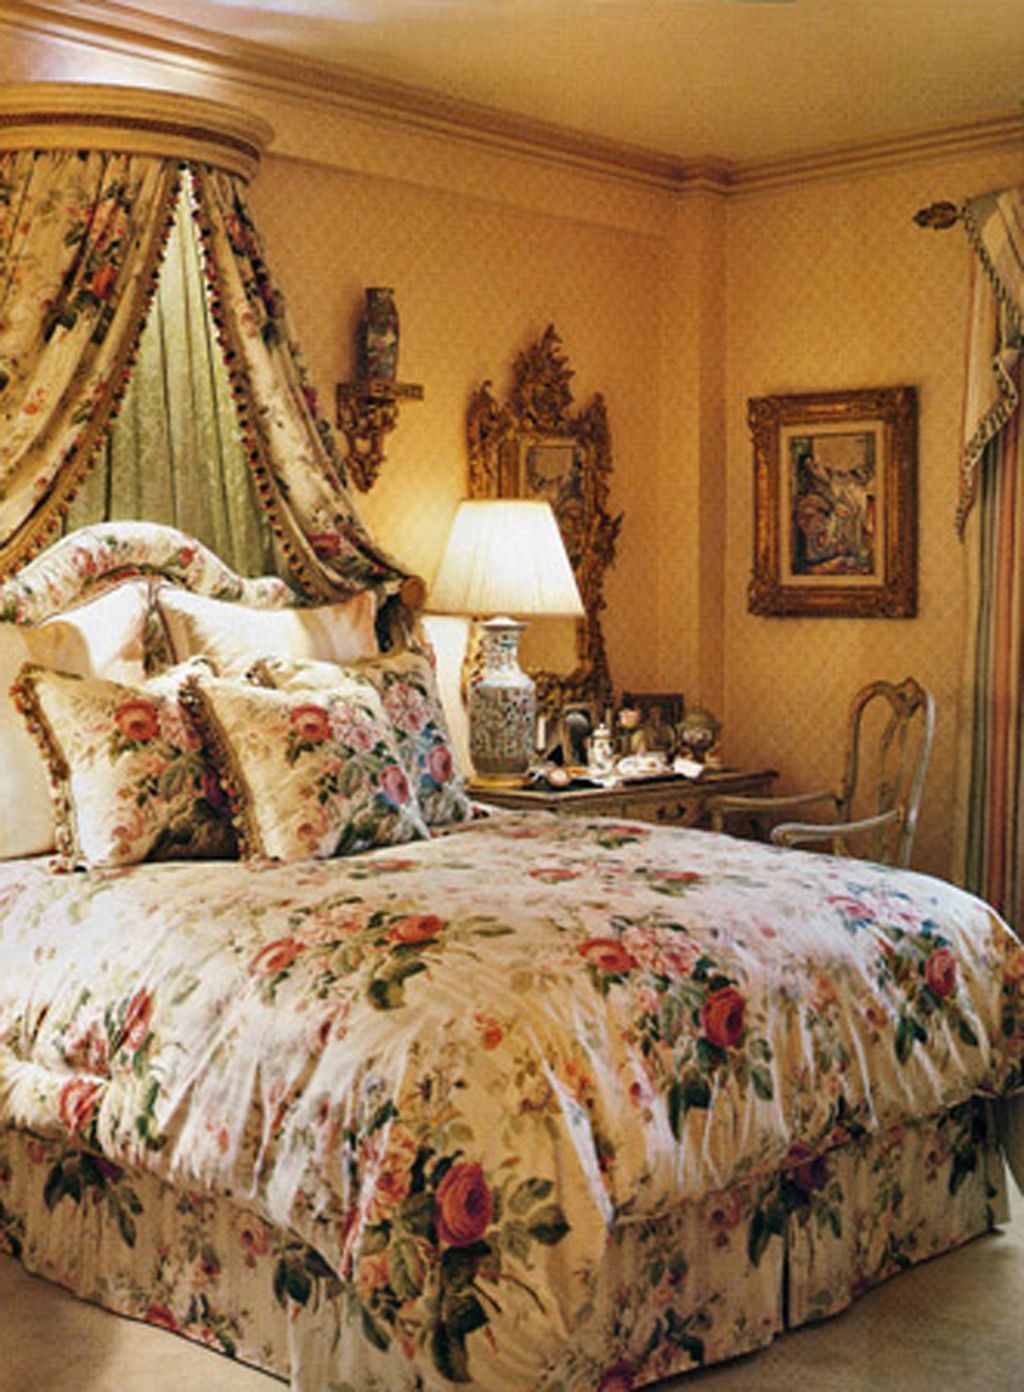 Beautiful Romantic Bedrooms: 96+ Inexpensive Romantic Bedroom Design Ideas You Will